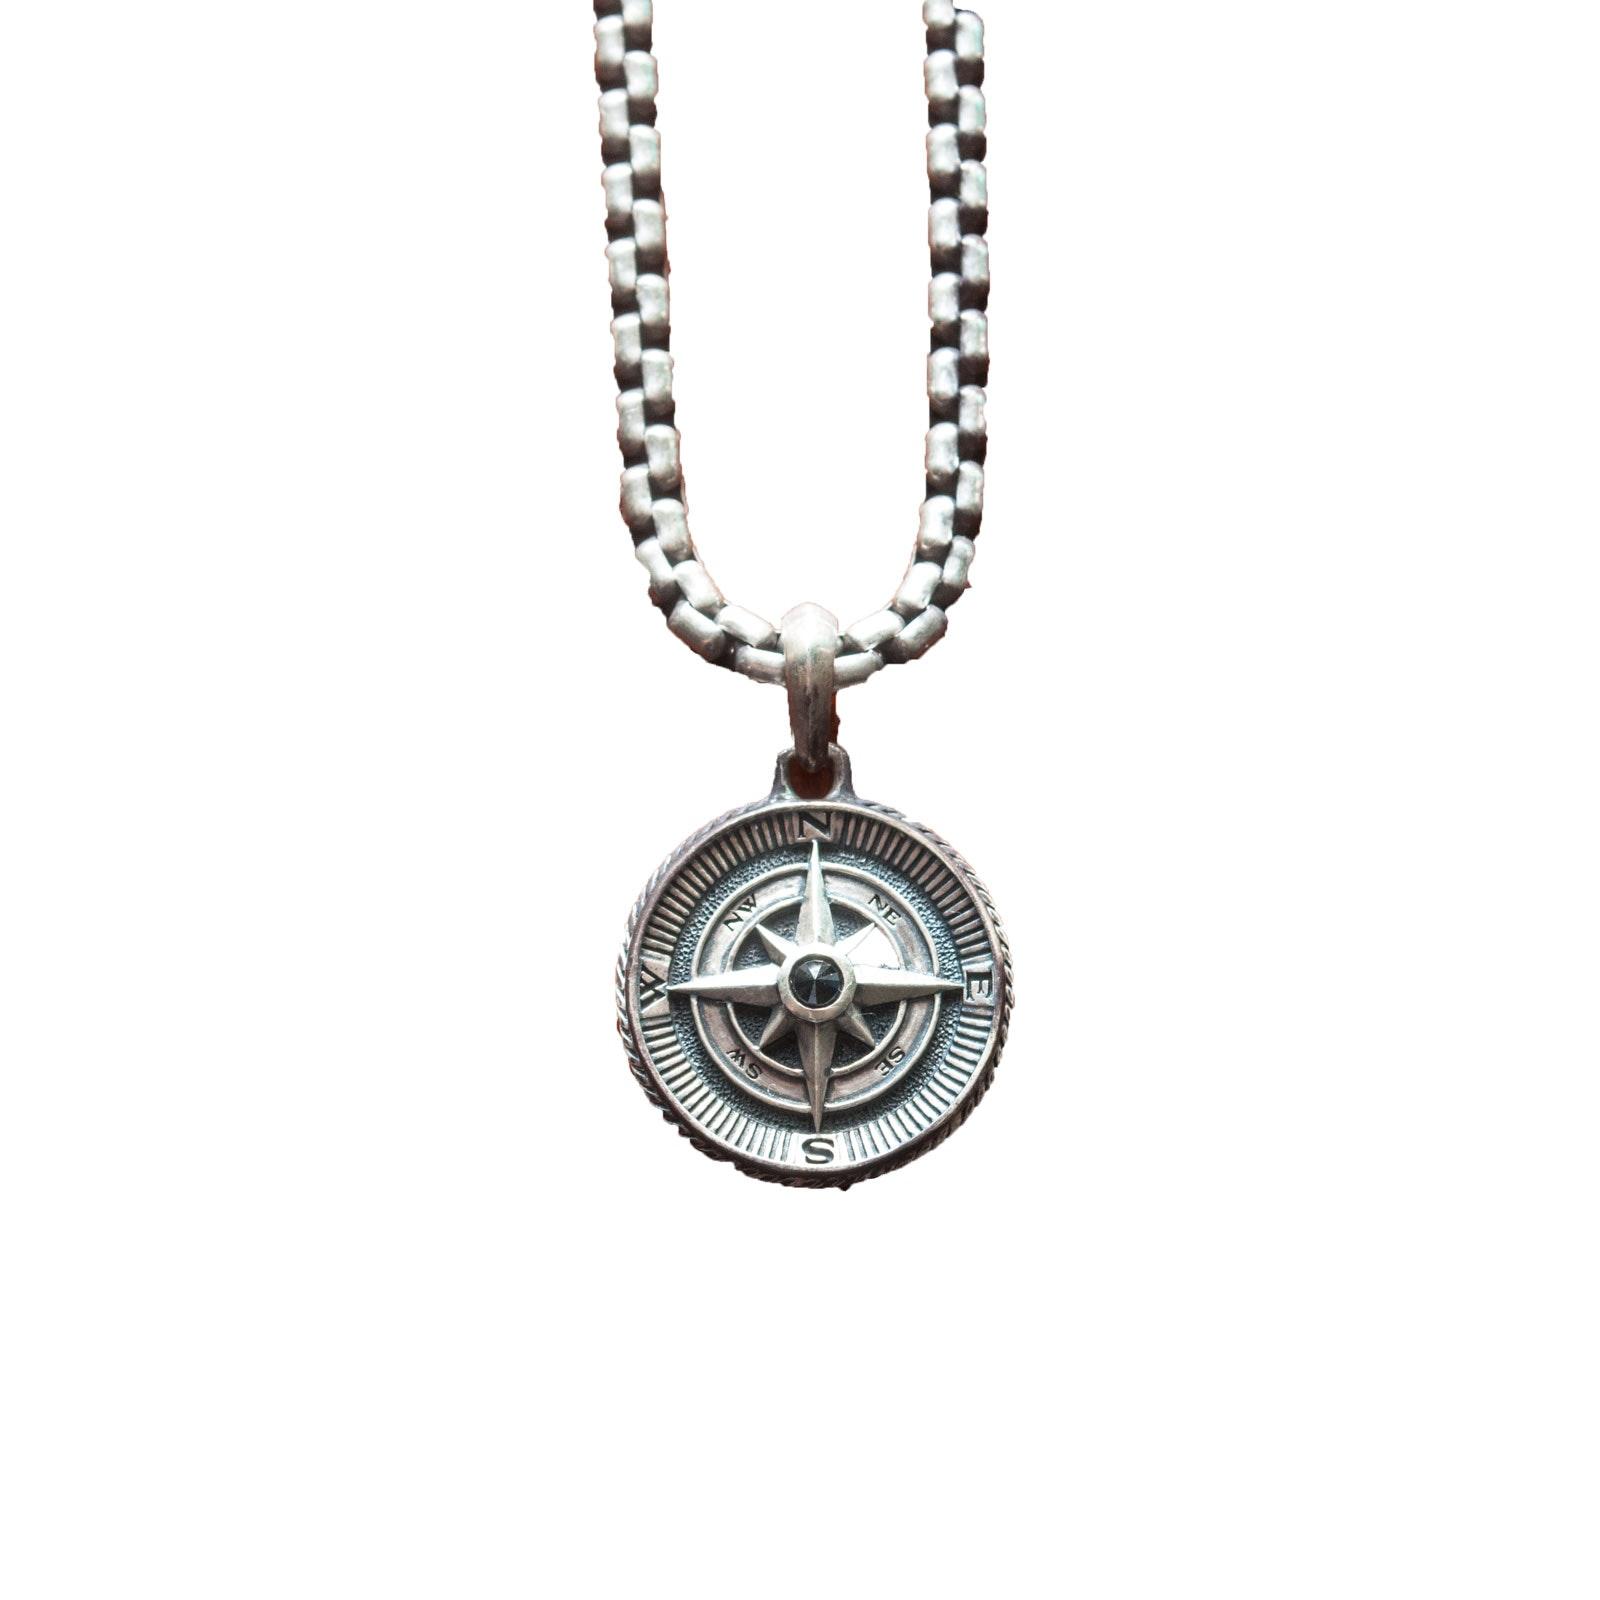 David Yurman Sterling Silver Necklace with Diamond Set 'Maritime' Compass Amulet